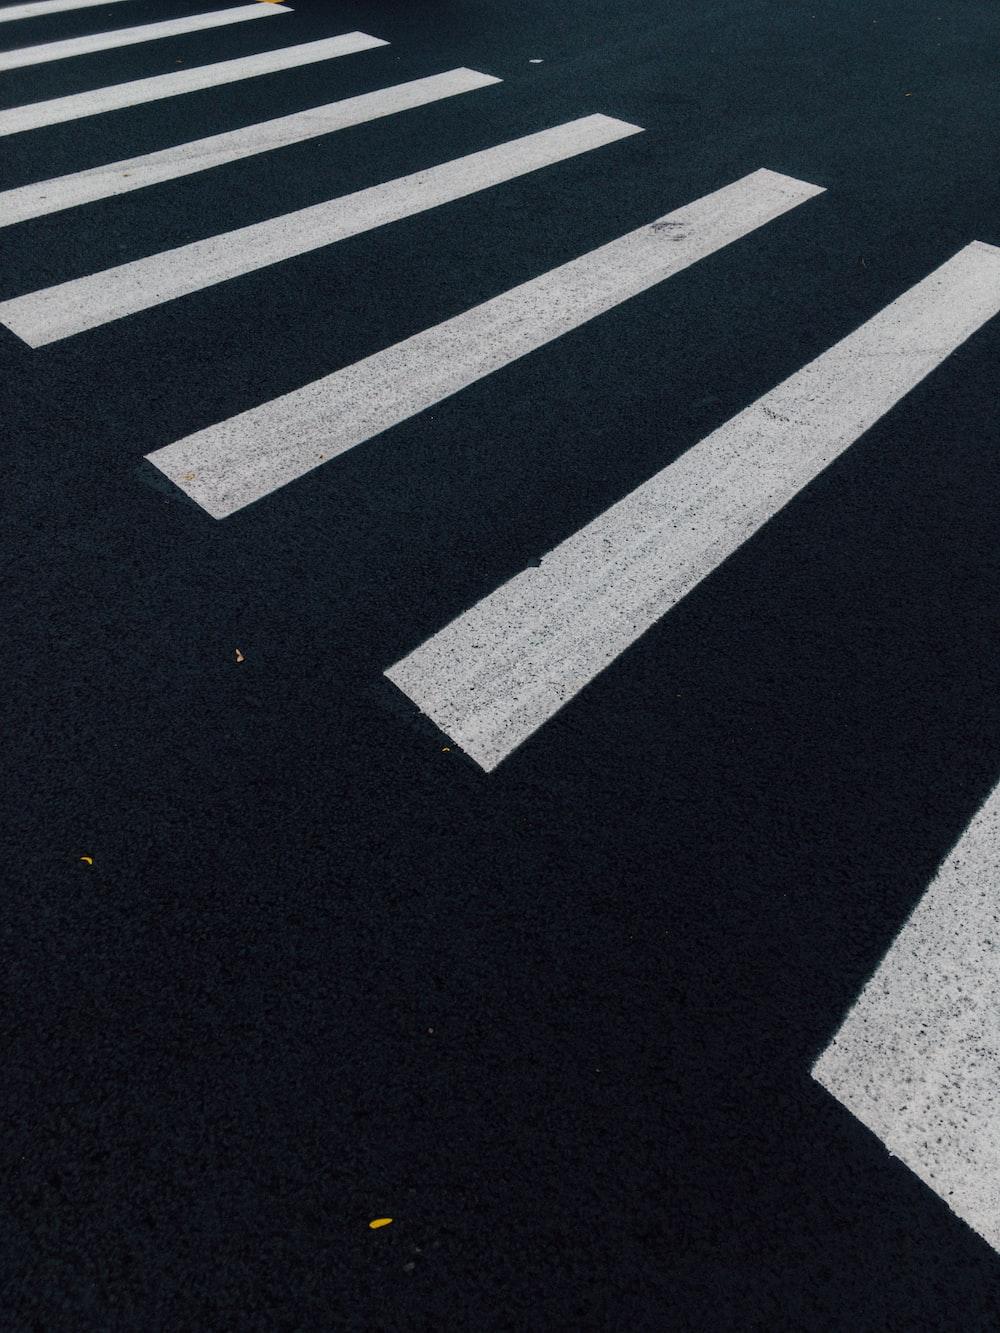 photography of pedestrian lane